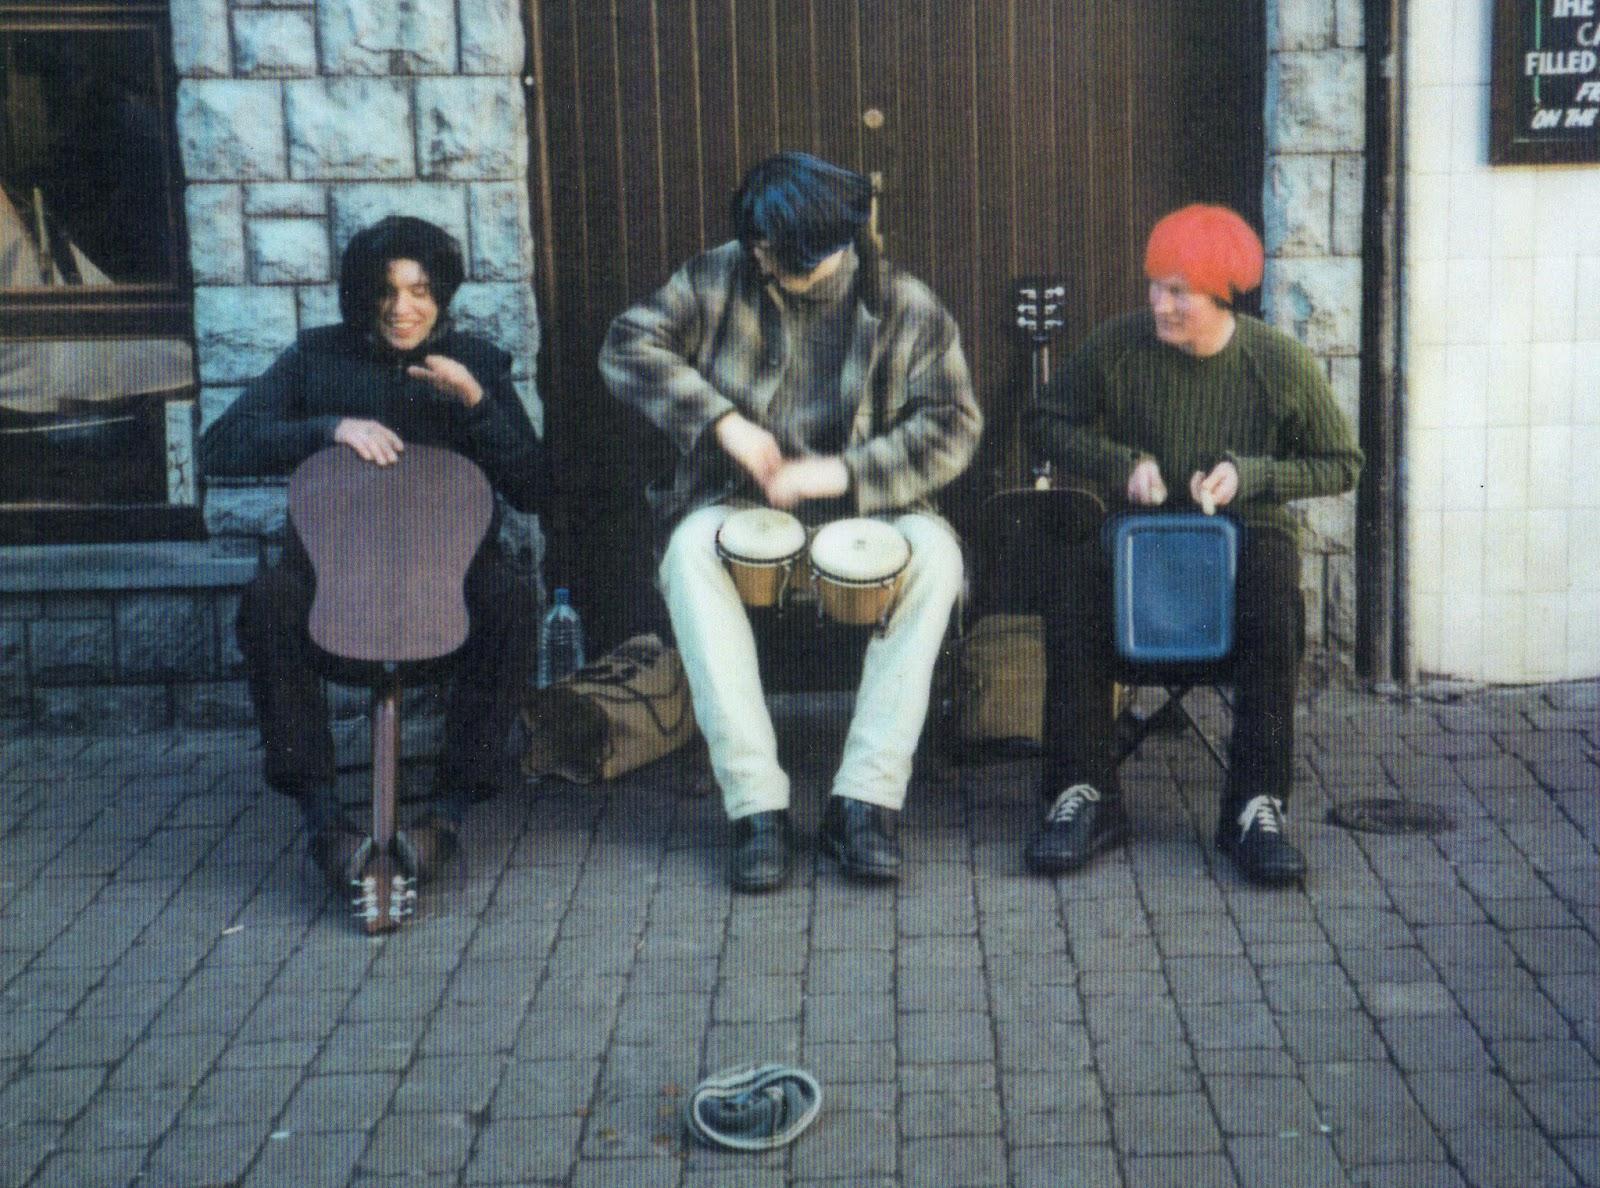 Three men in wigs busking in Galway, Ireland